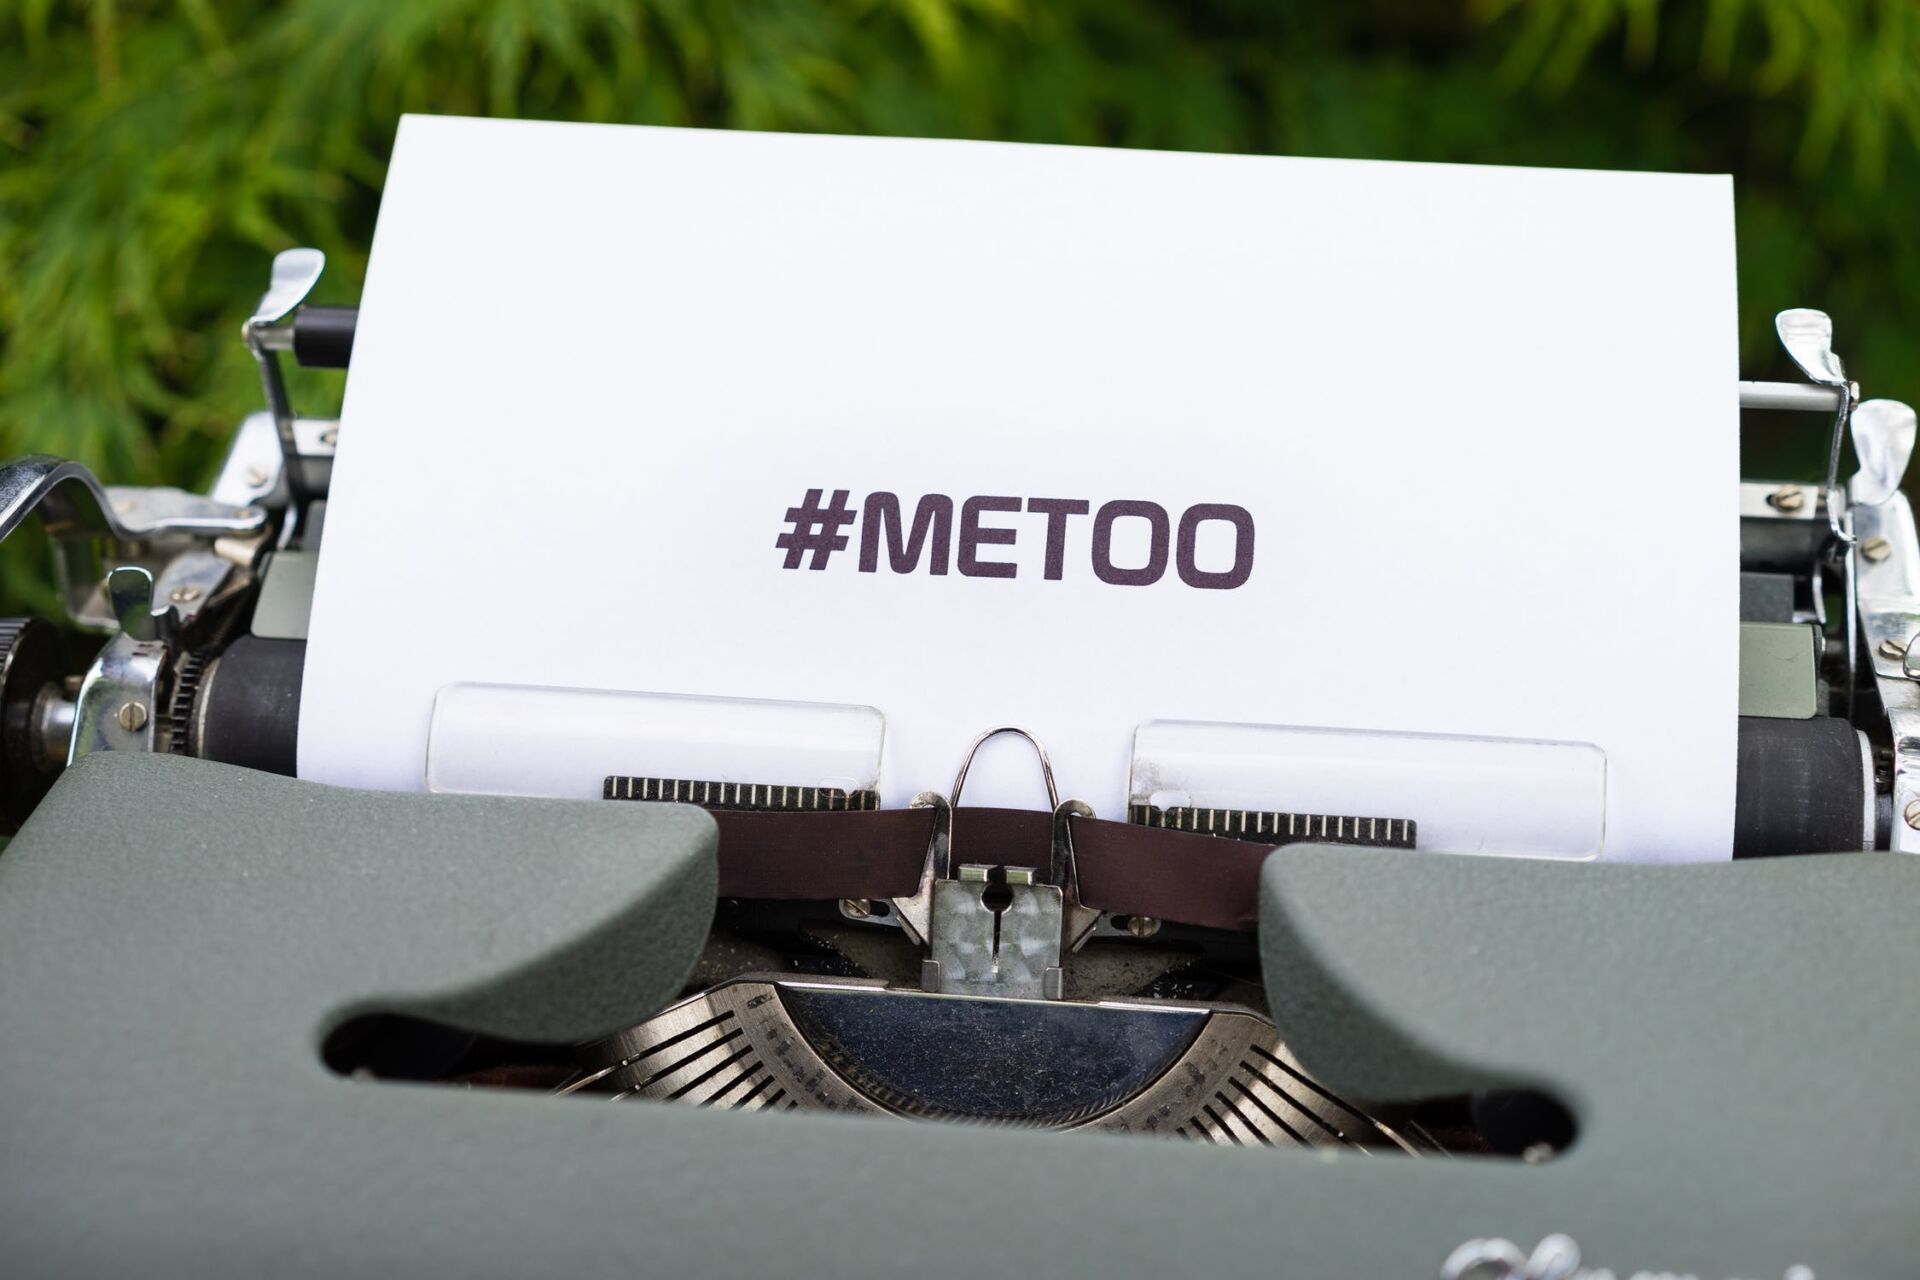 #metoo typemachine